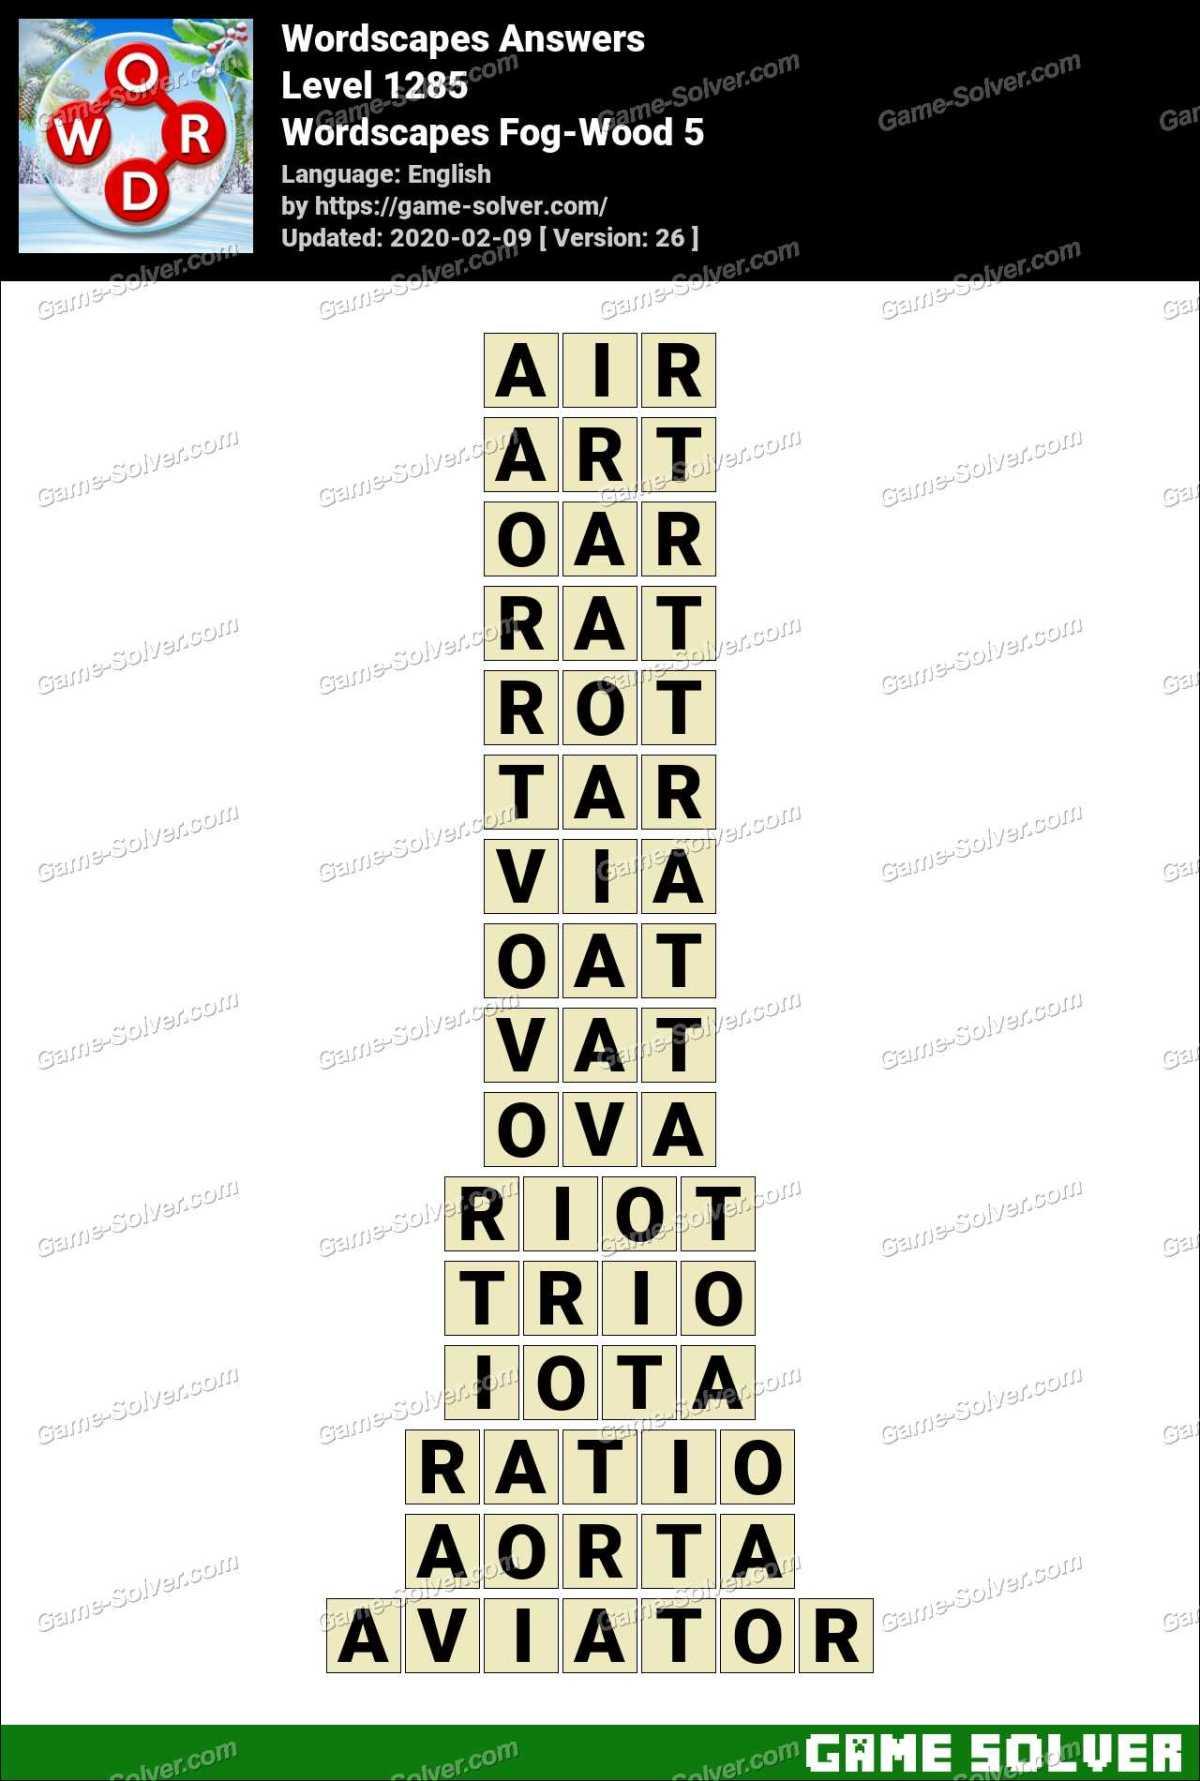 Wordscapes Fog-Wood 5 Answers